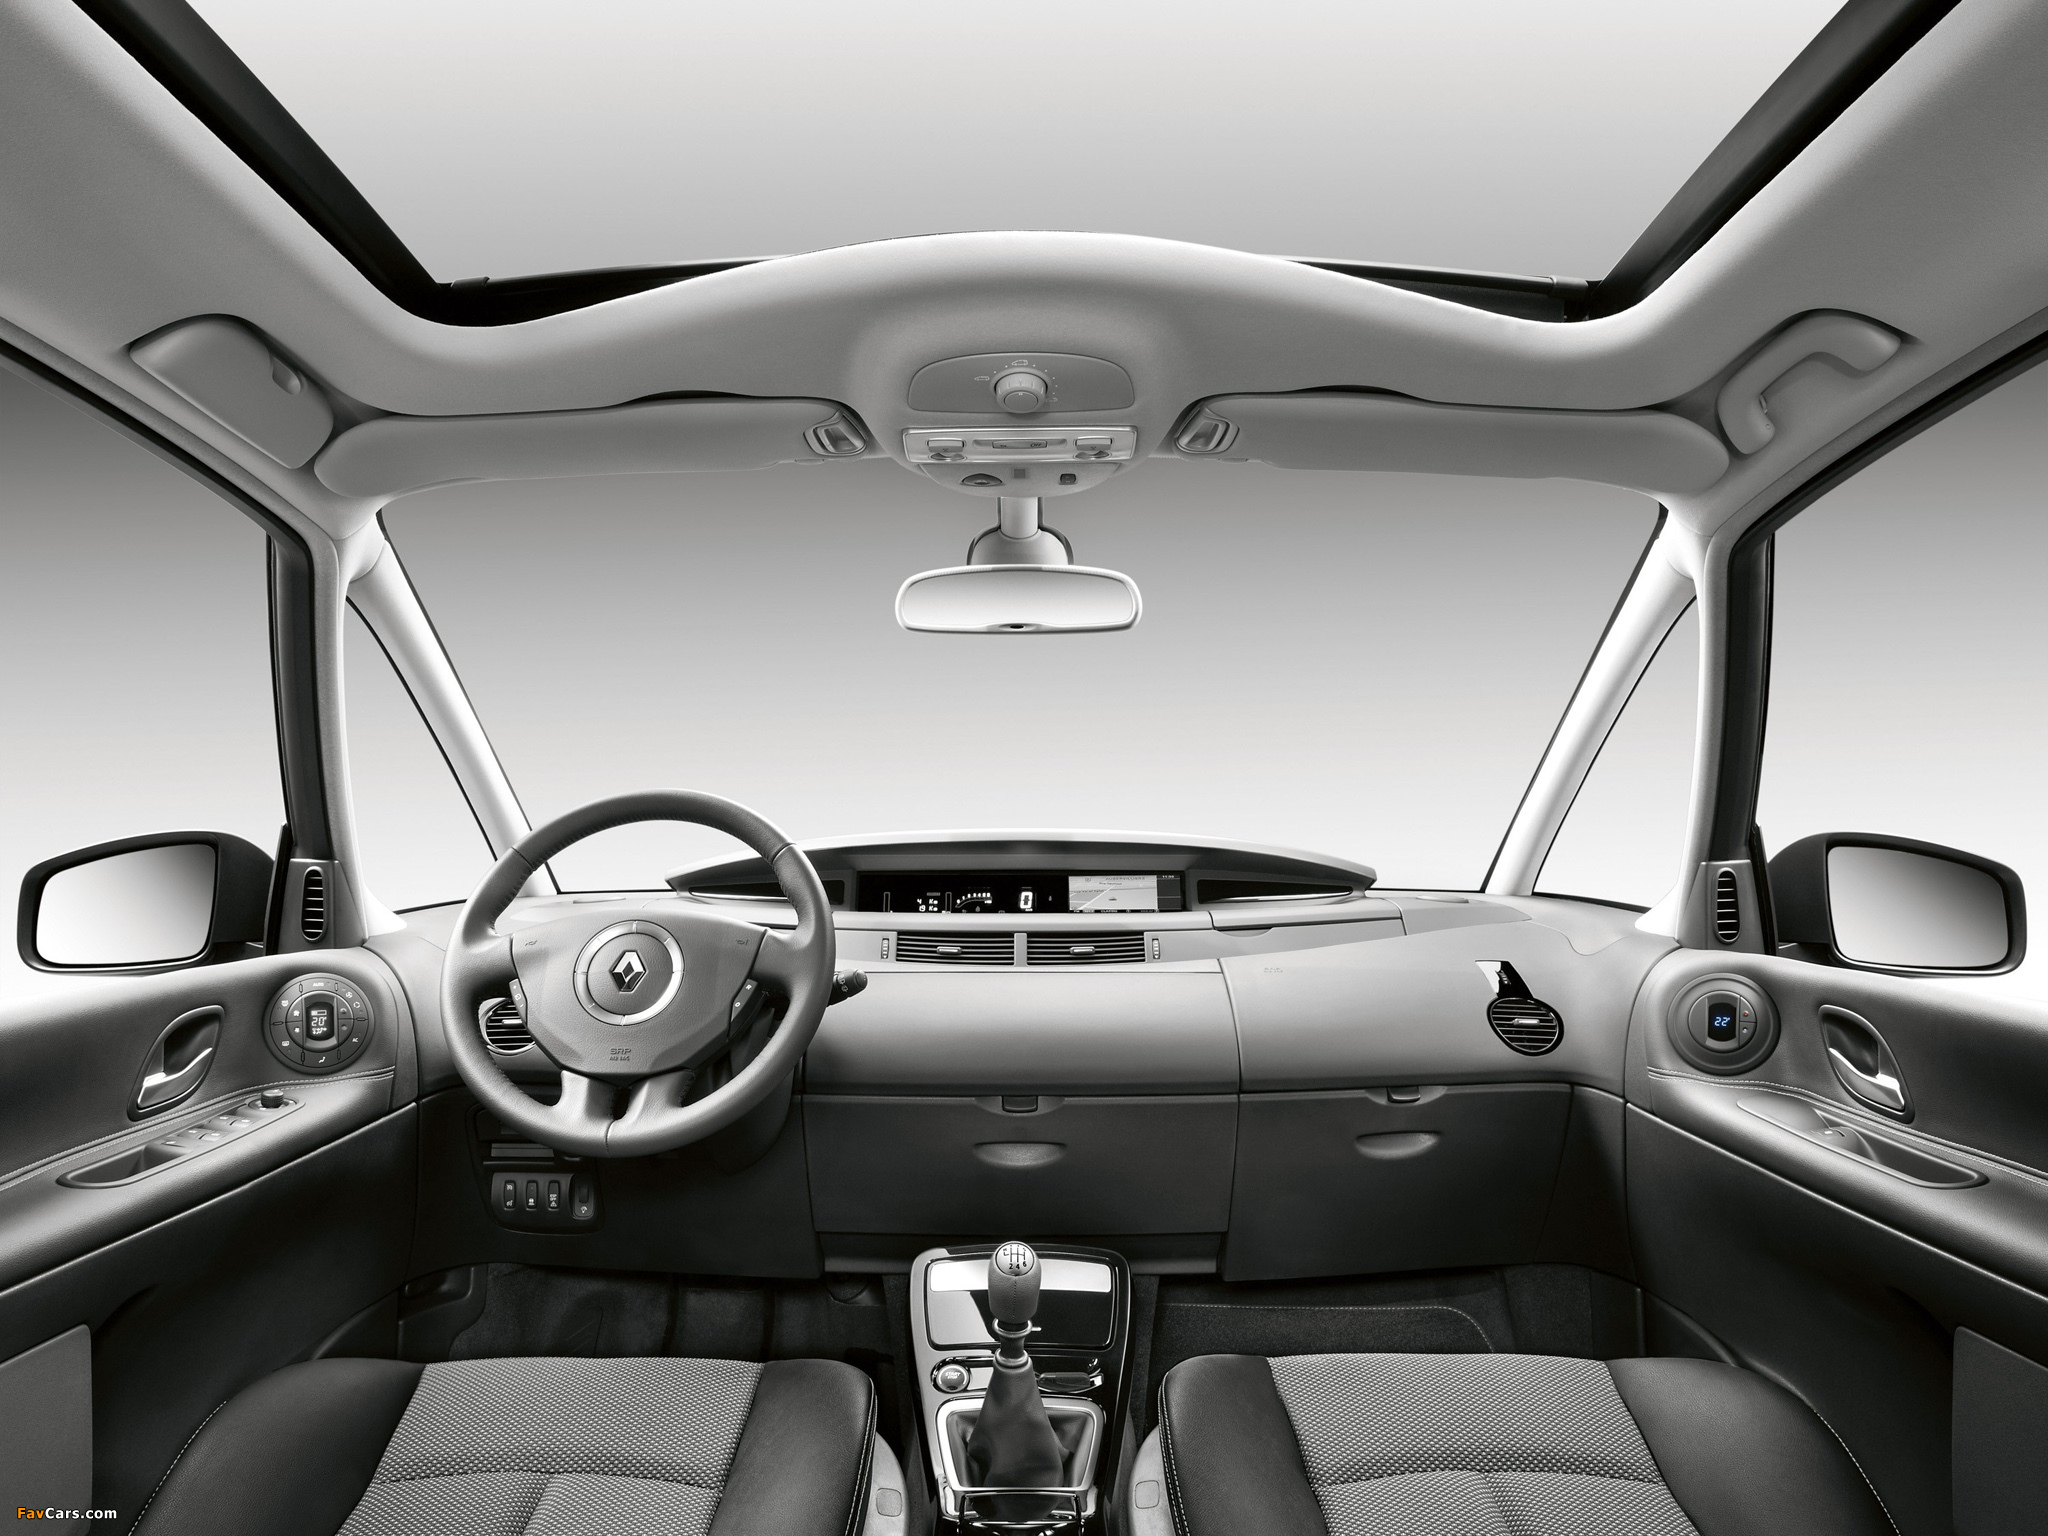 Renault Espace (J81) 2006 pictures (2048 x 1536)